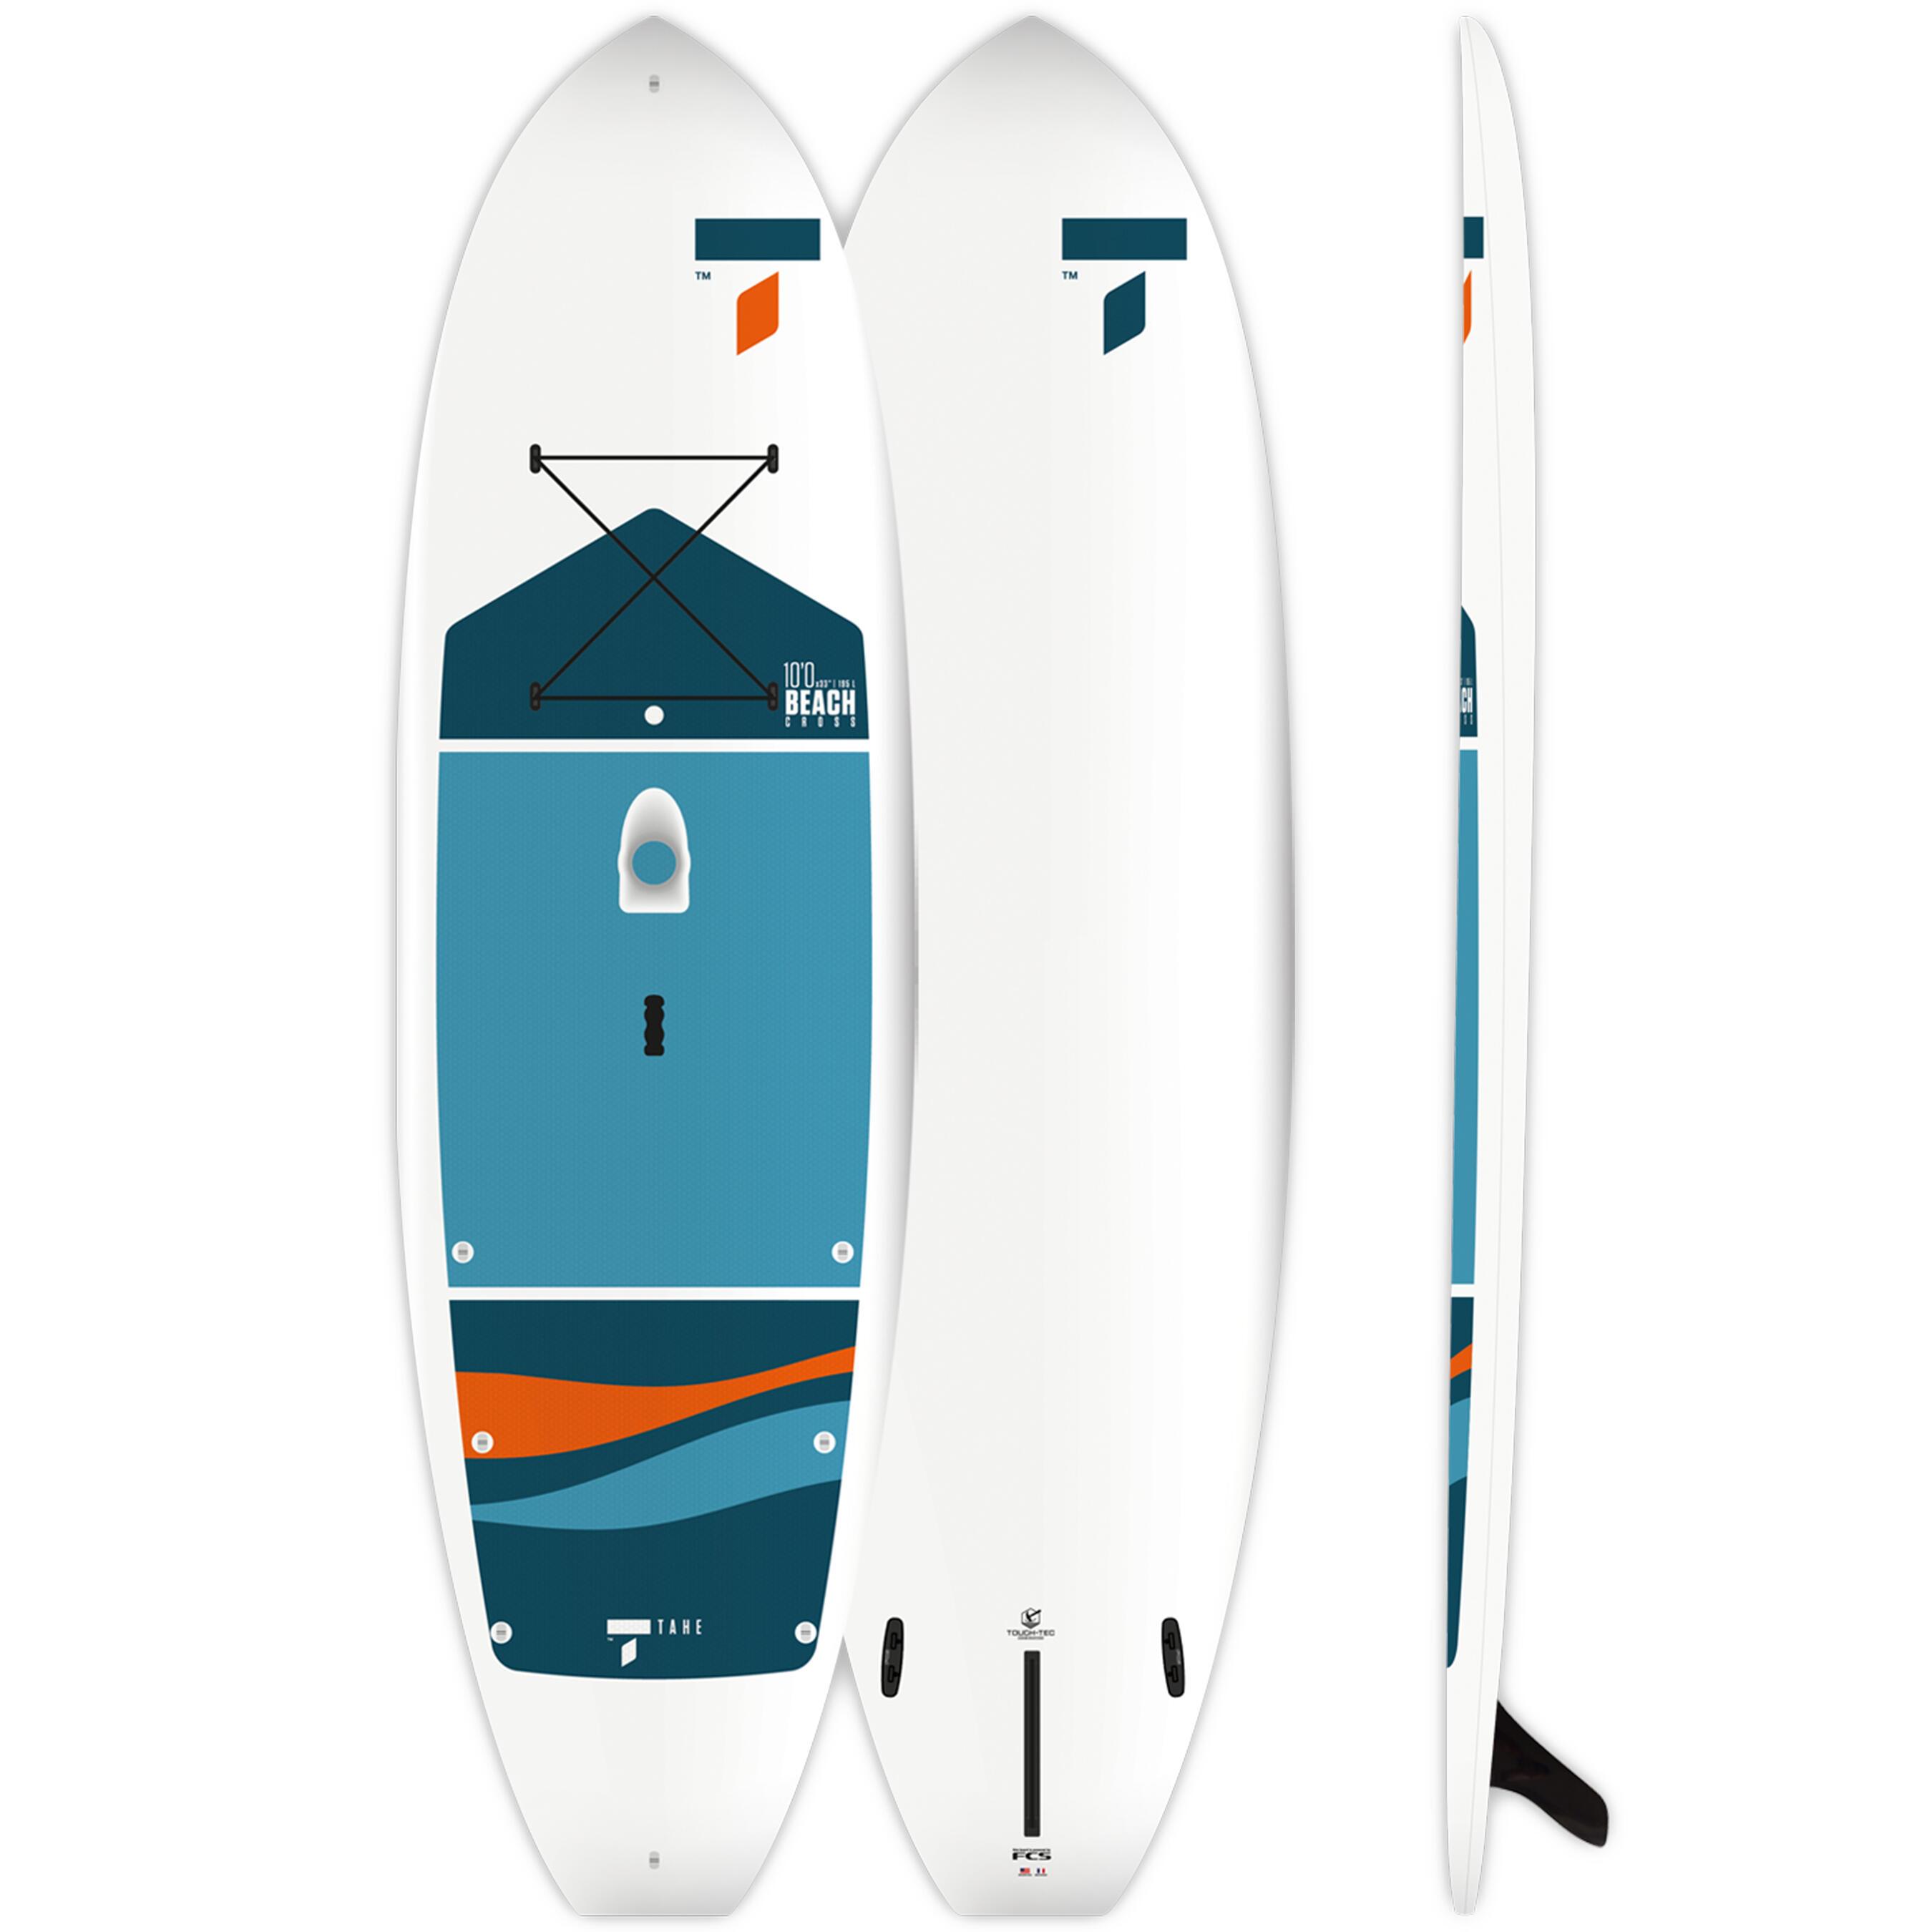 SUP TAHE 10'0 BEACH CROSS TT imagine